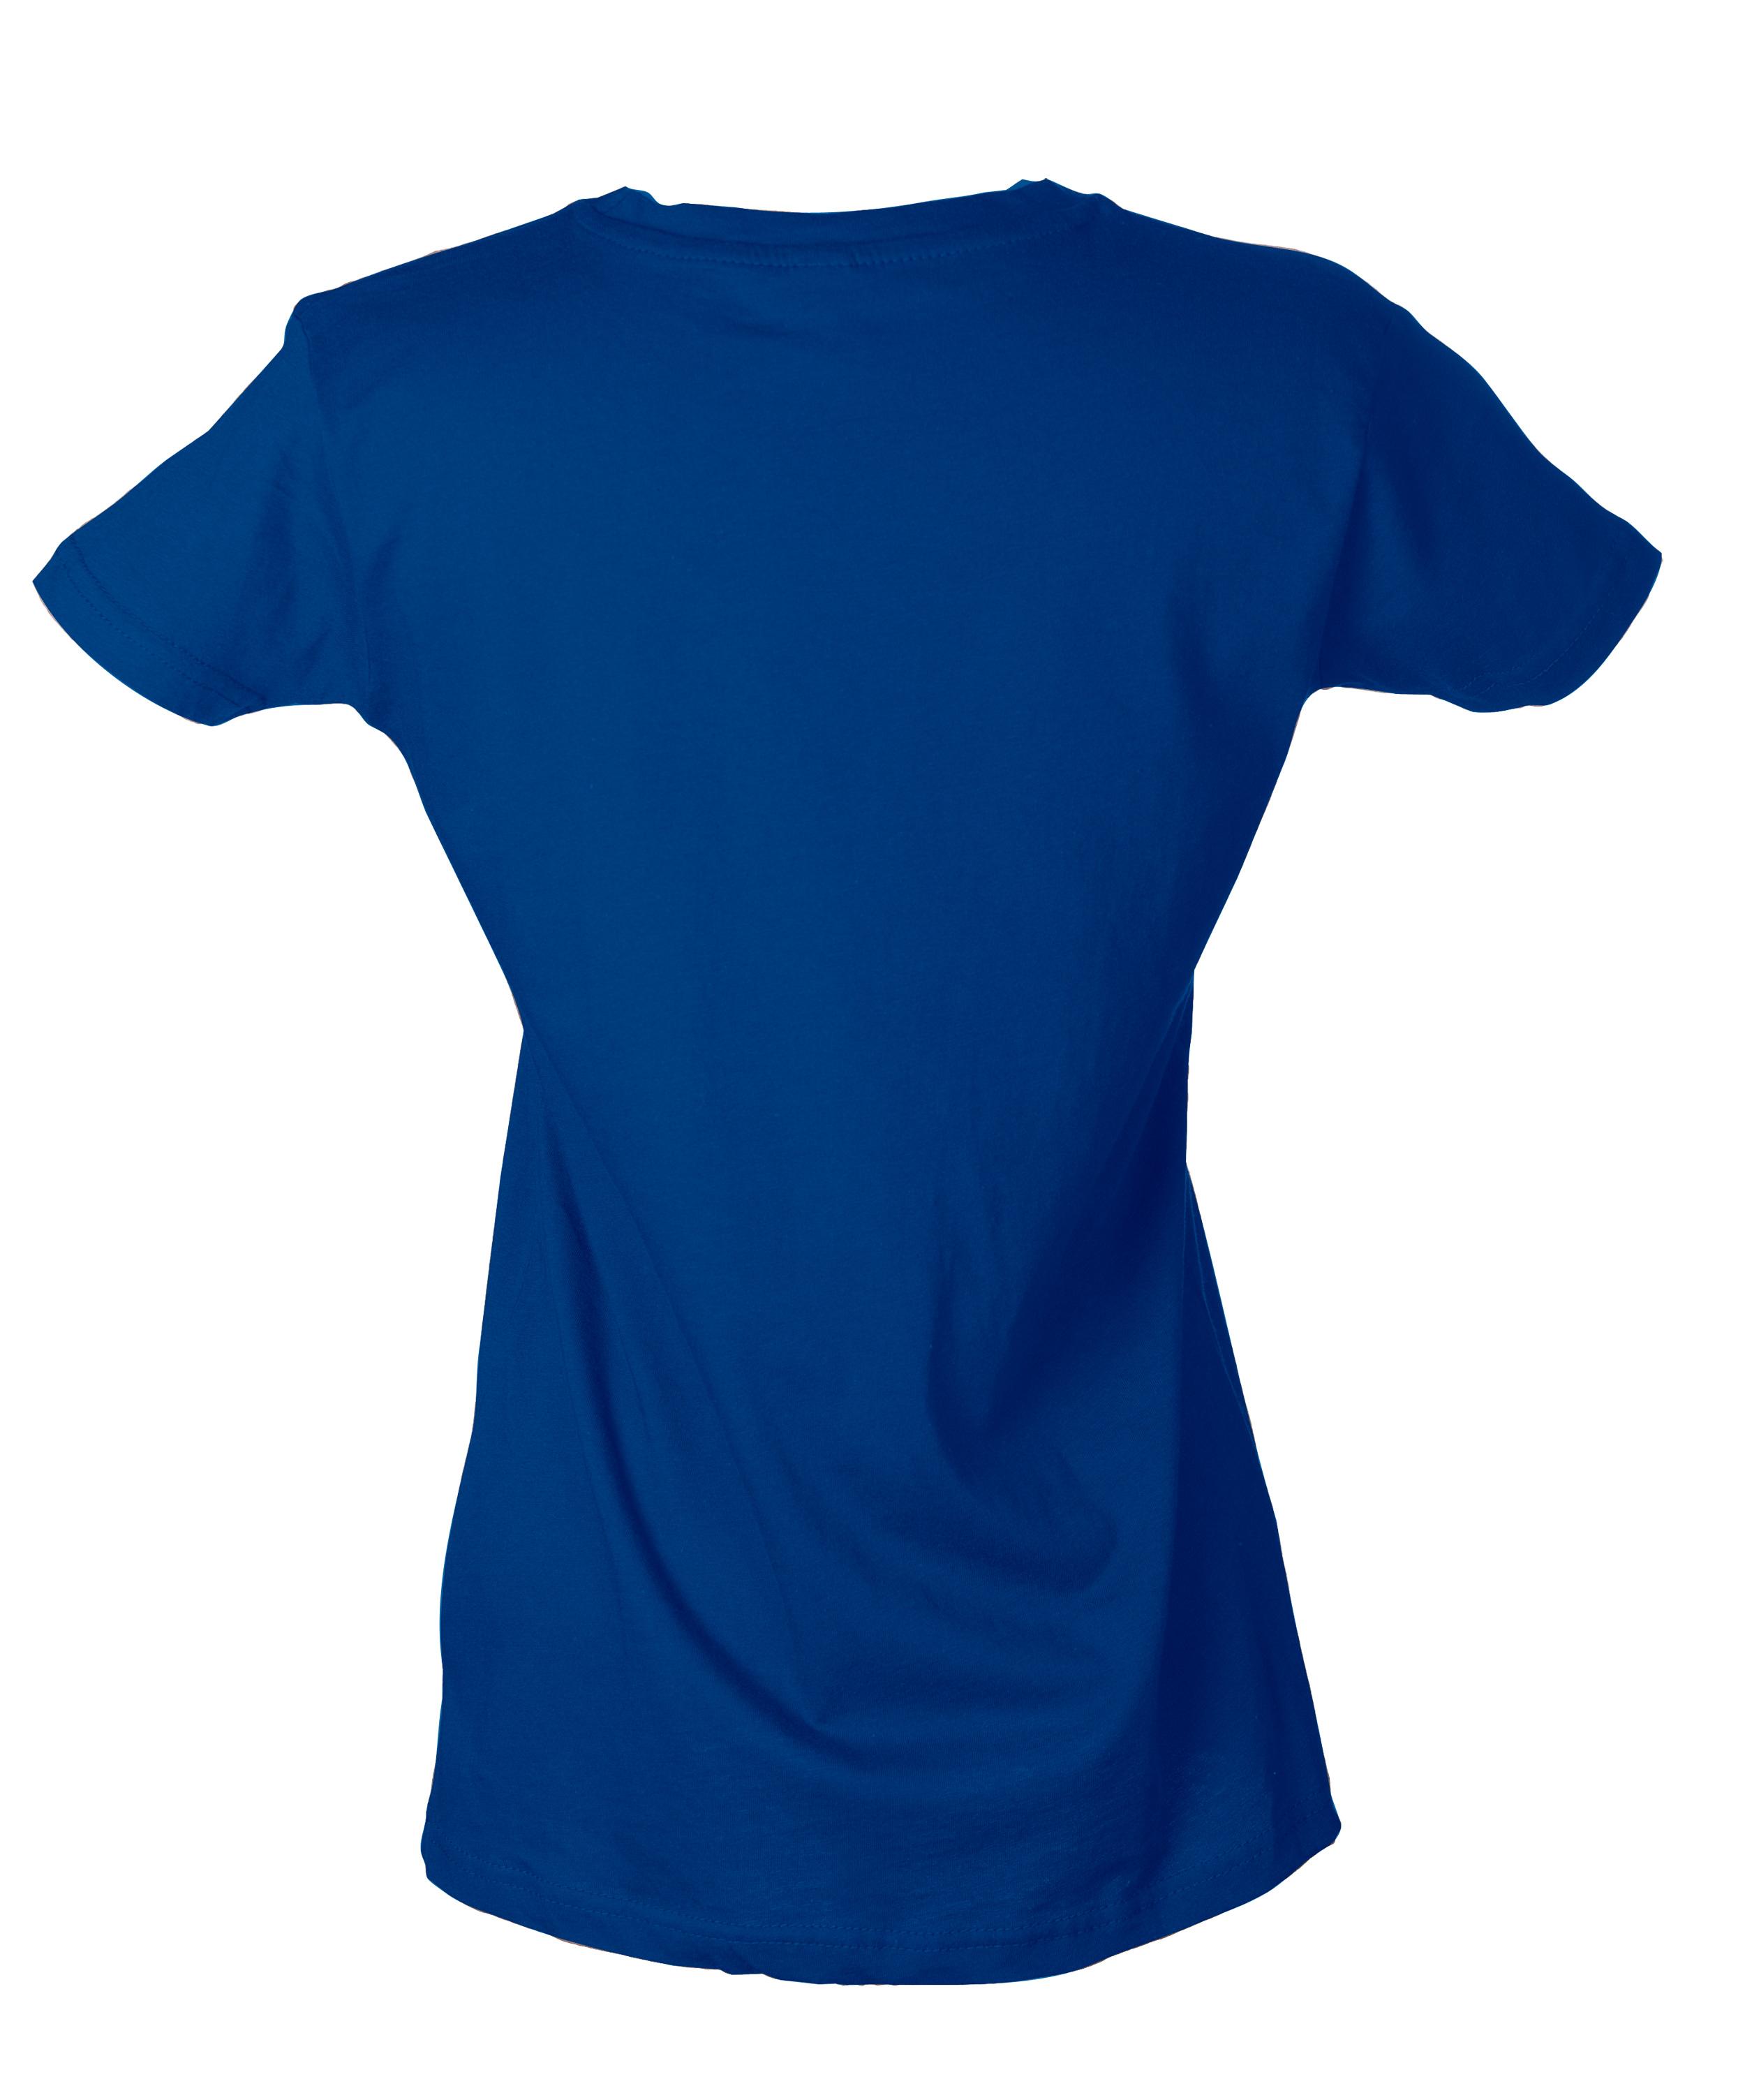 Tultex 213- Ladies\' Slim Fit Fine Jersey Tee T-Shirt - Images | Tultex